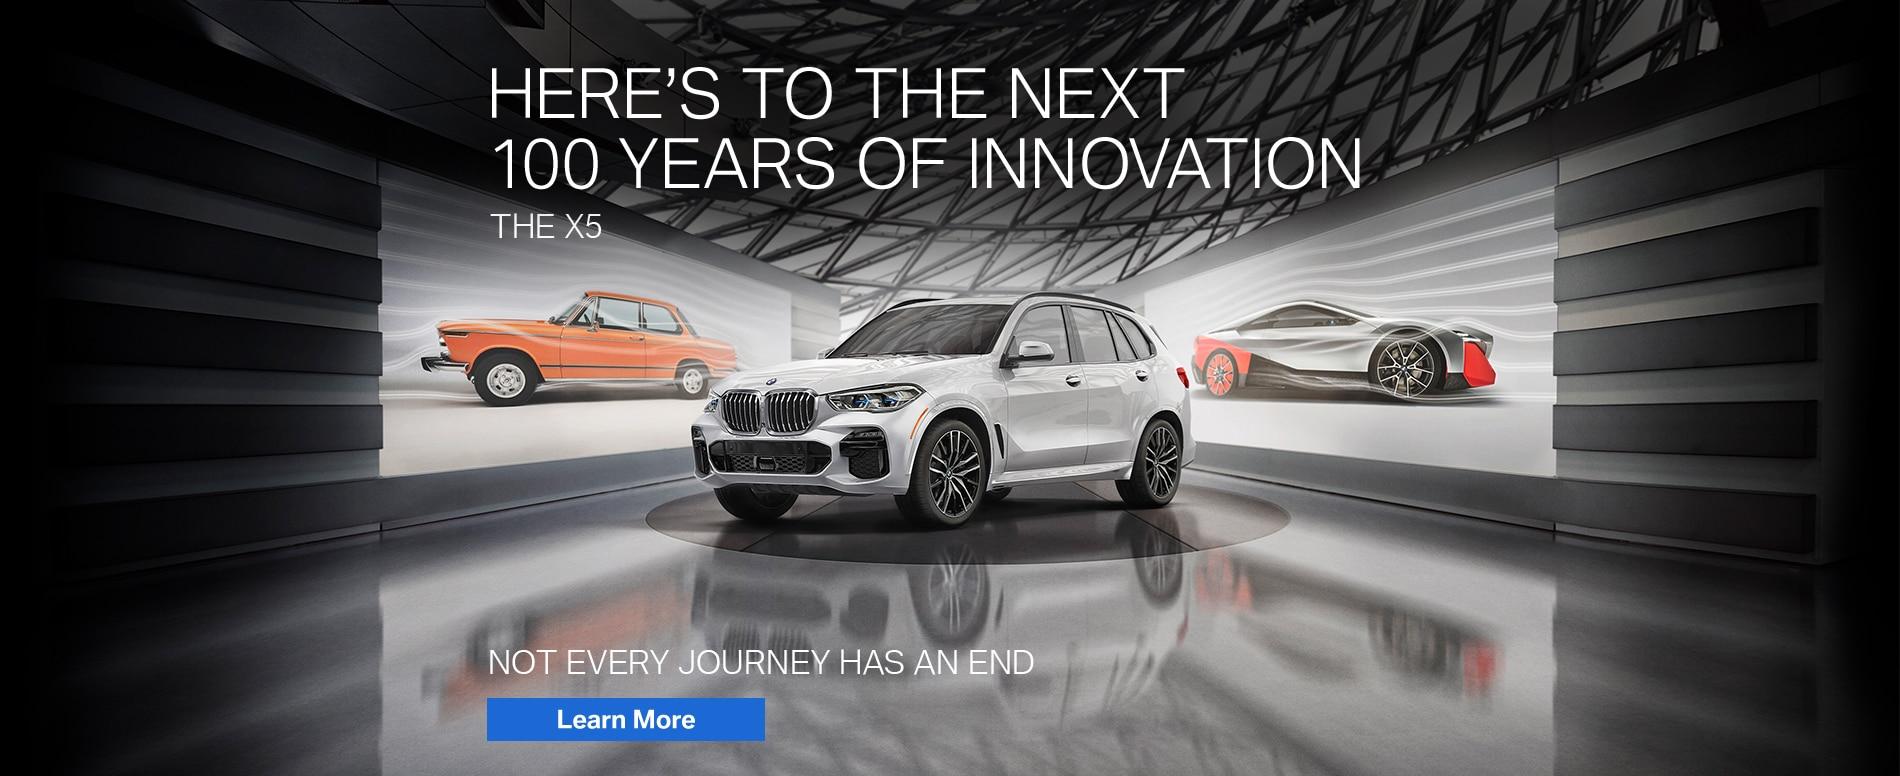 Daniels BMW | New & Used BMW Dealership in Allentown PA